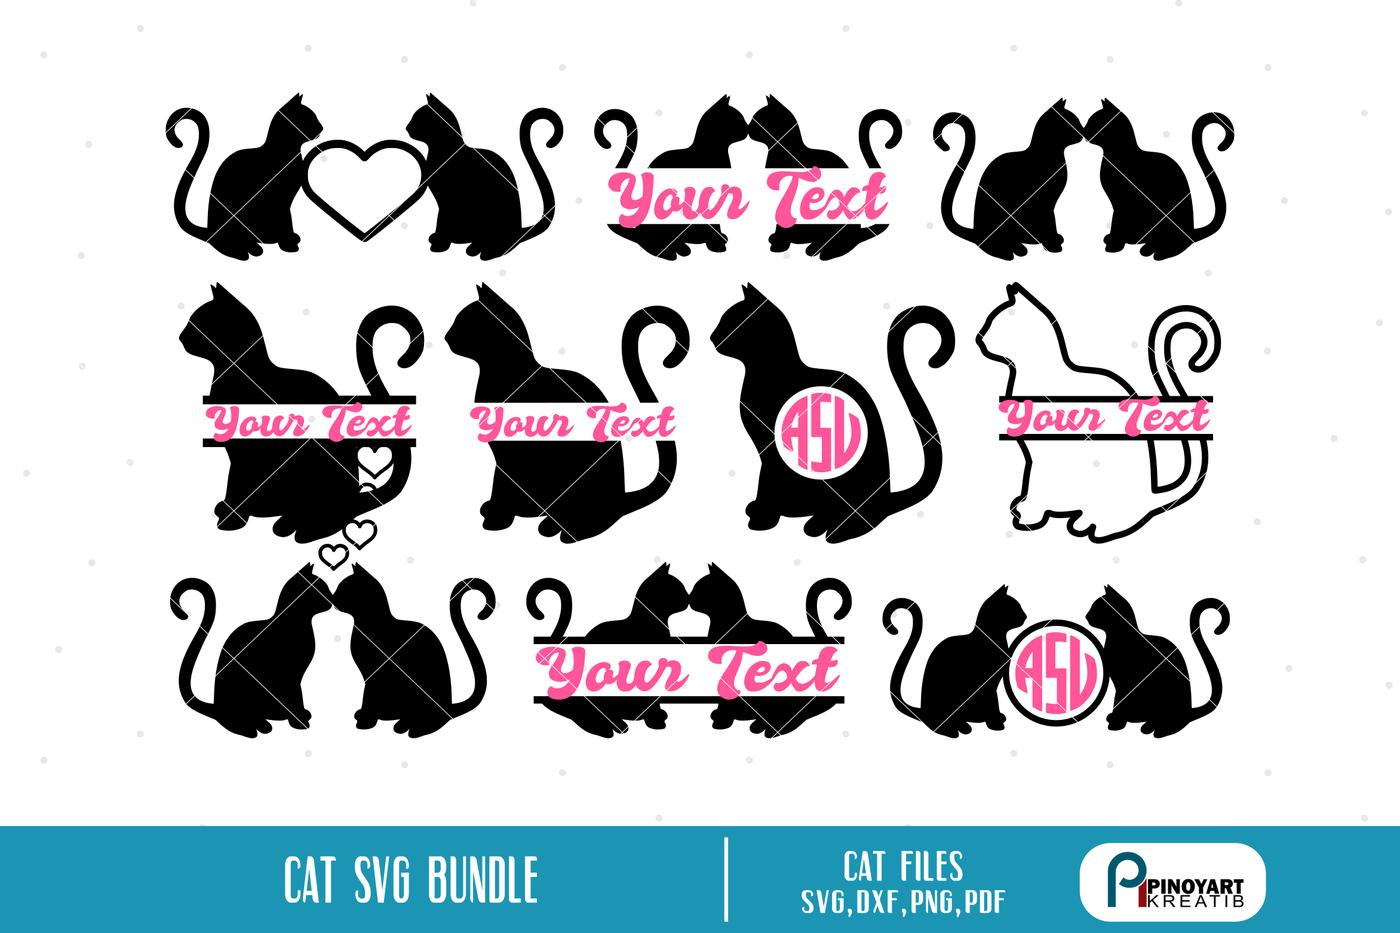 Cat Svg Cat Monogram Cat Svg Cat Svg For Cricut Cat Svg For